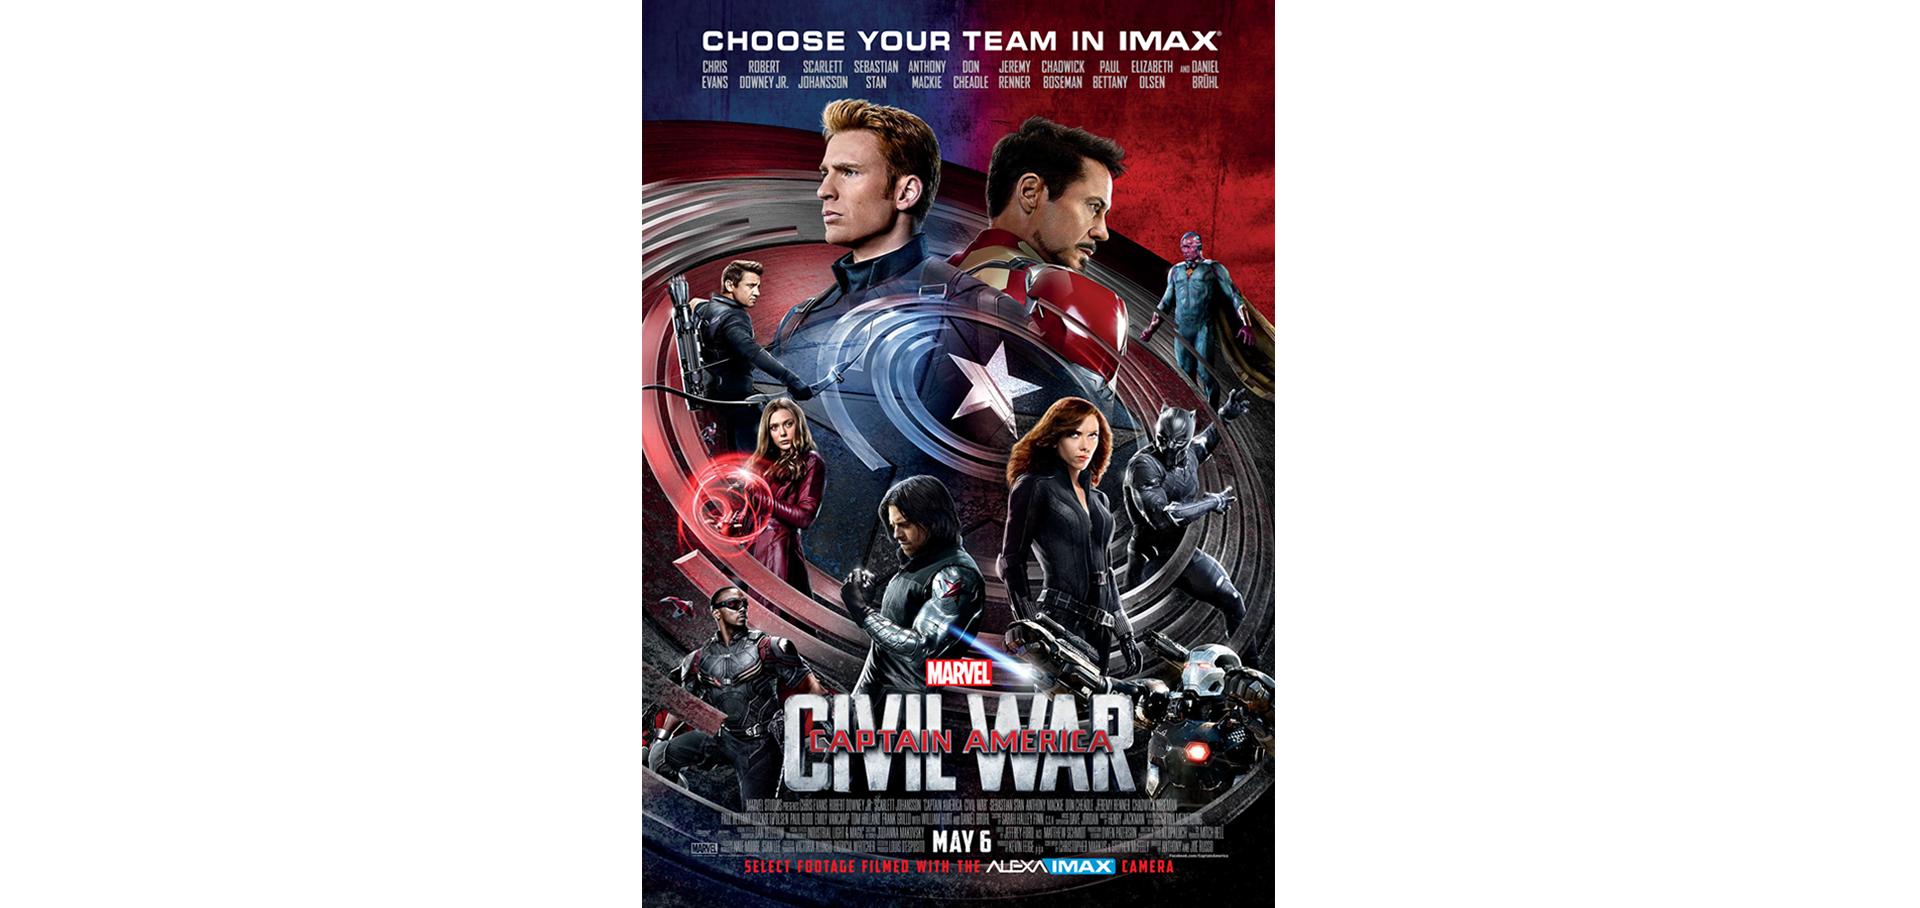 captain america civil war imax blu ray download